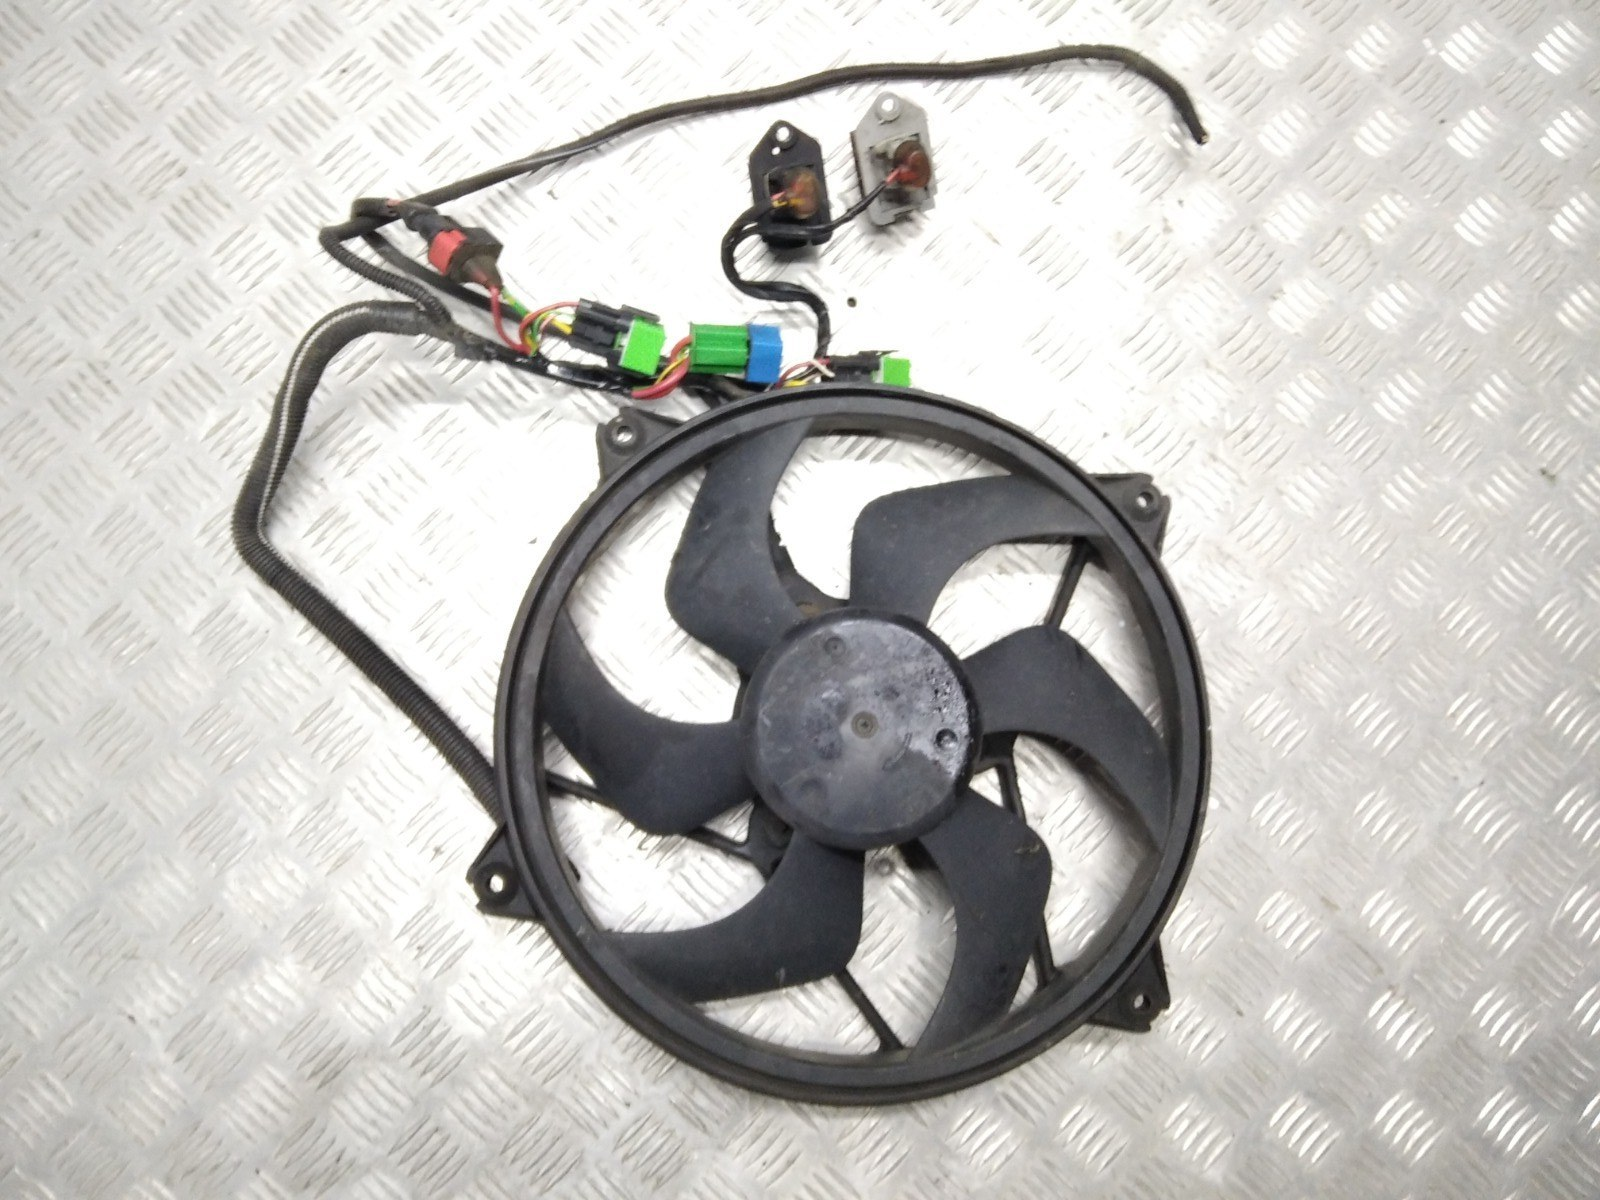 Вентилятор радиатора Peugeot 406 2.0 HDI 1999 (б/у)